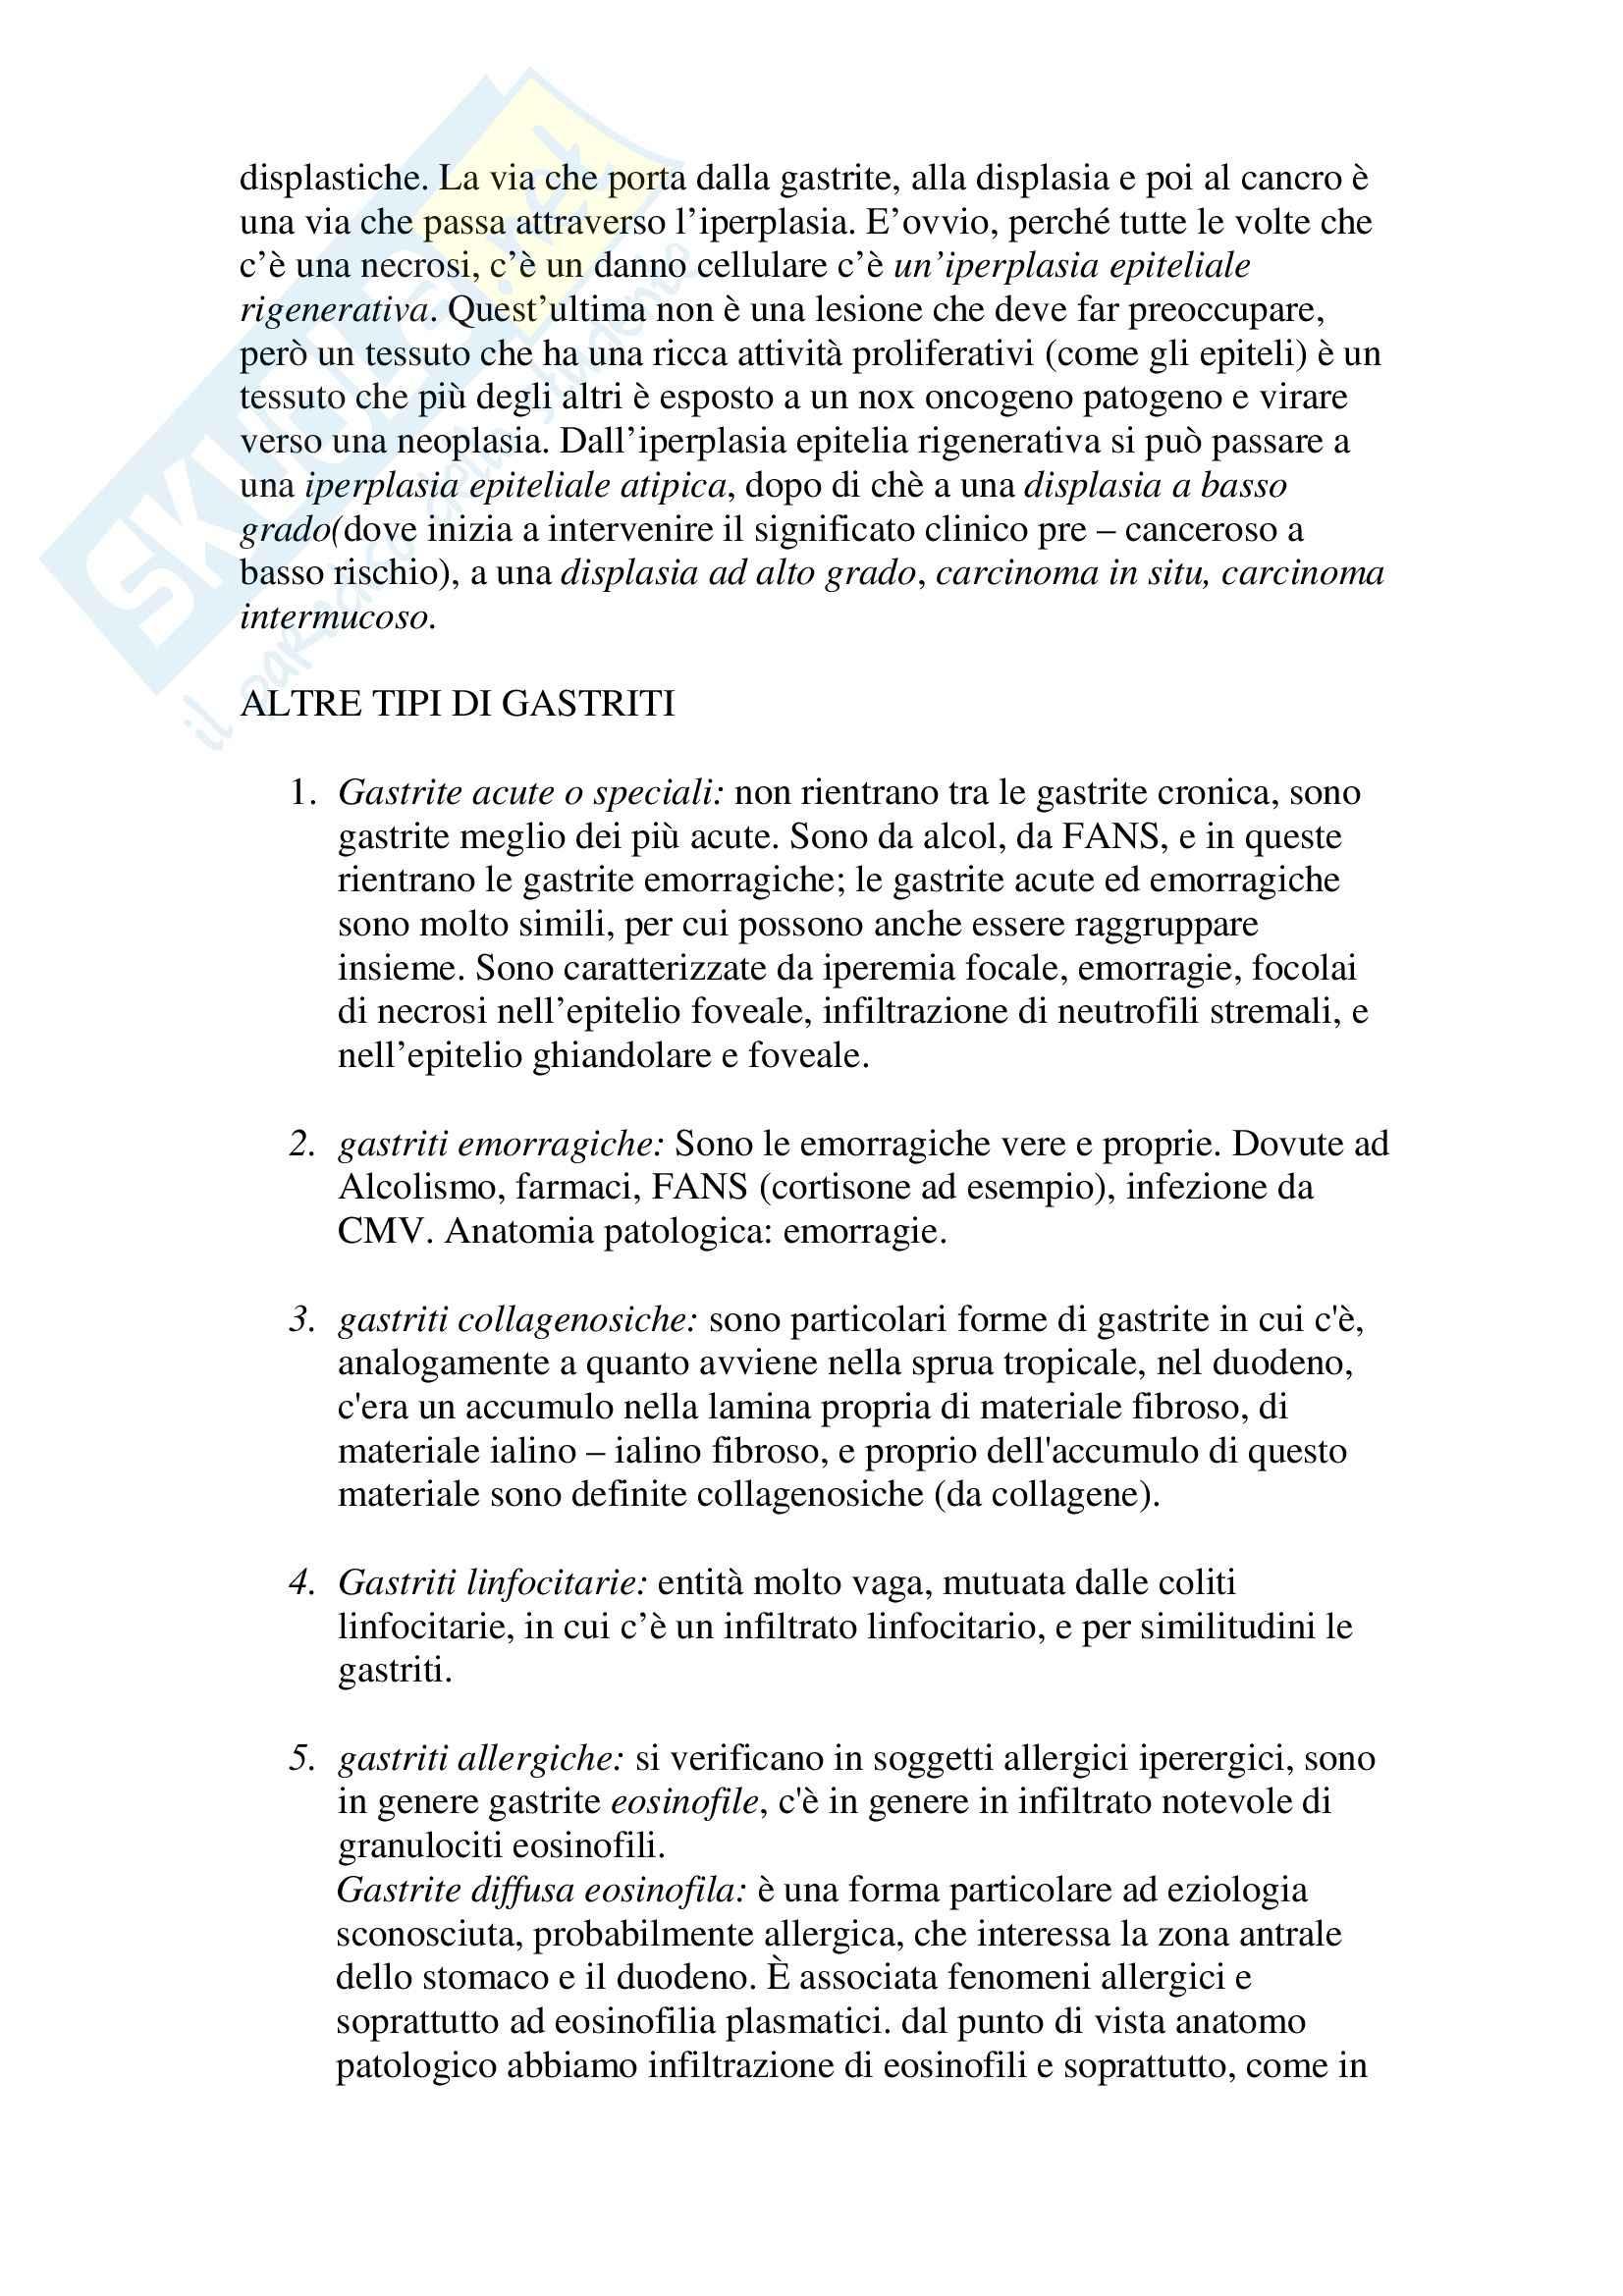 Anatomia patologica - iperplasia epiteliale Pag. 2